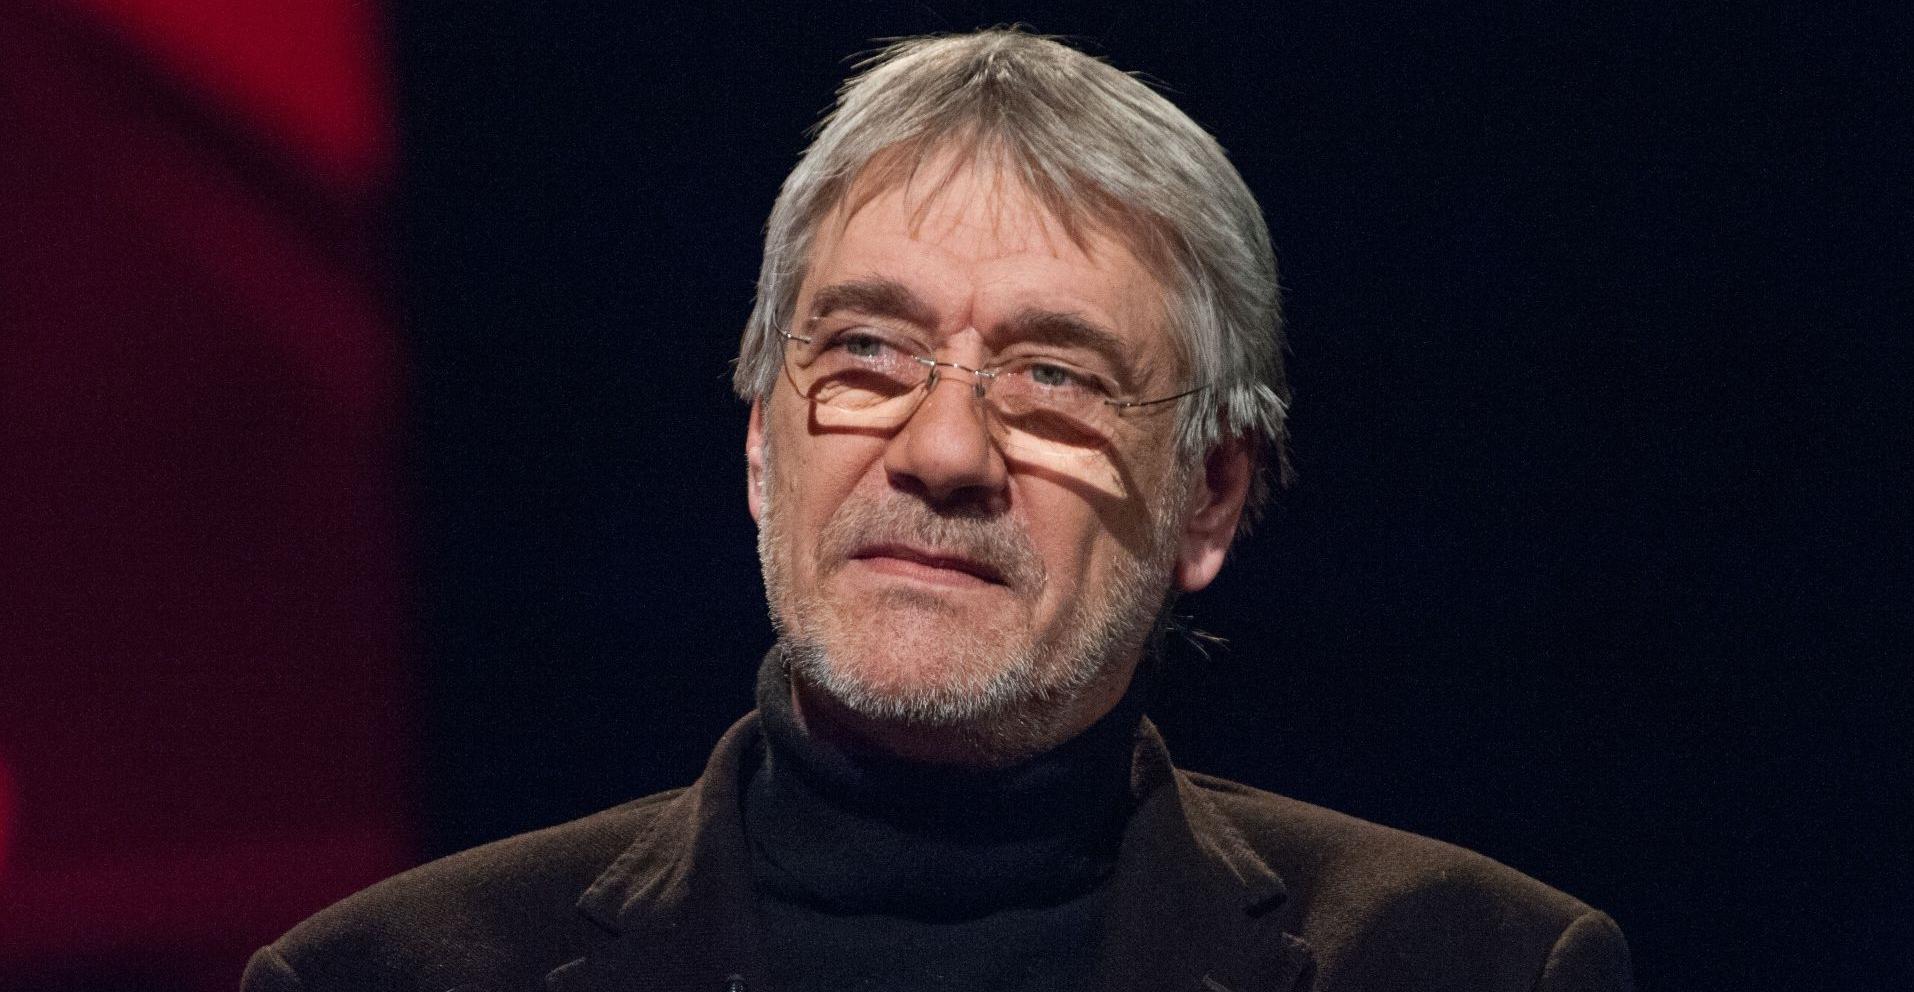 Marcel Iures teatru online, teatru, e-theatrum